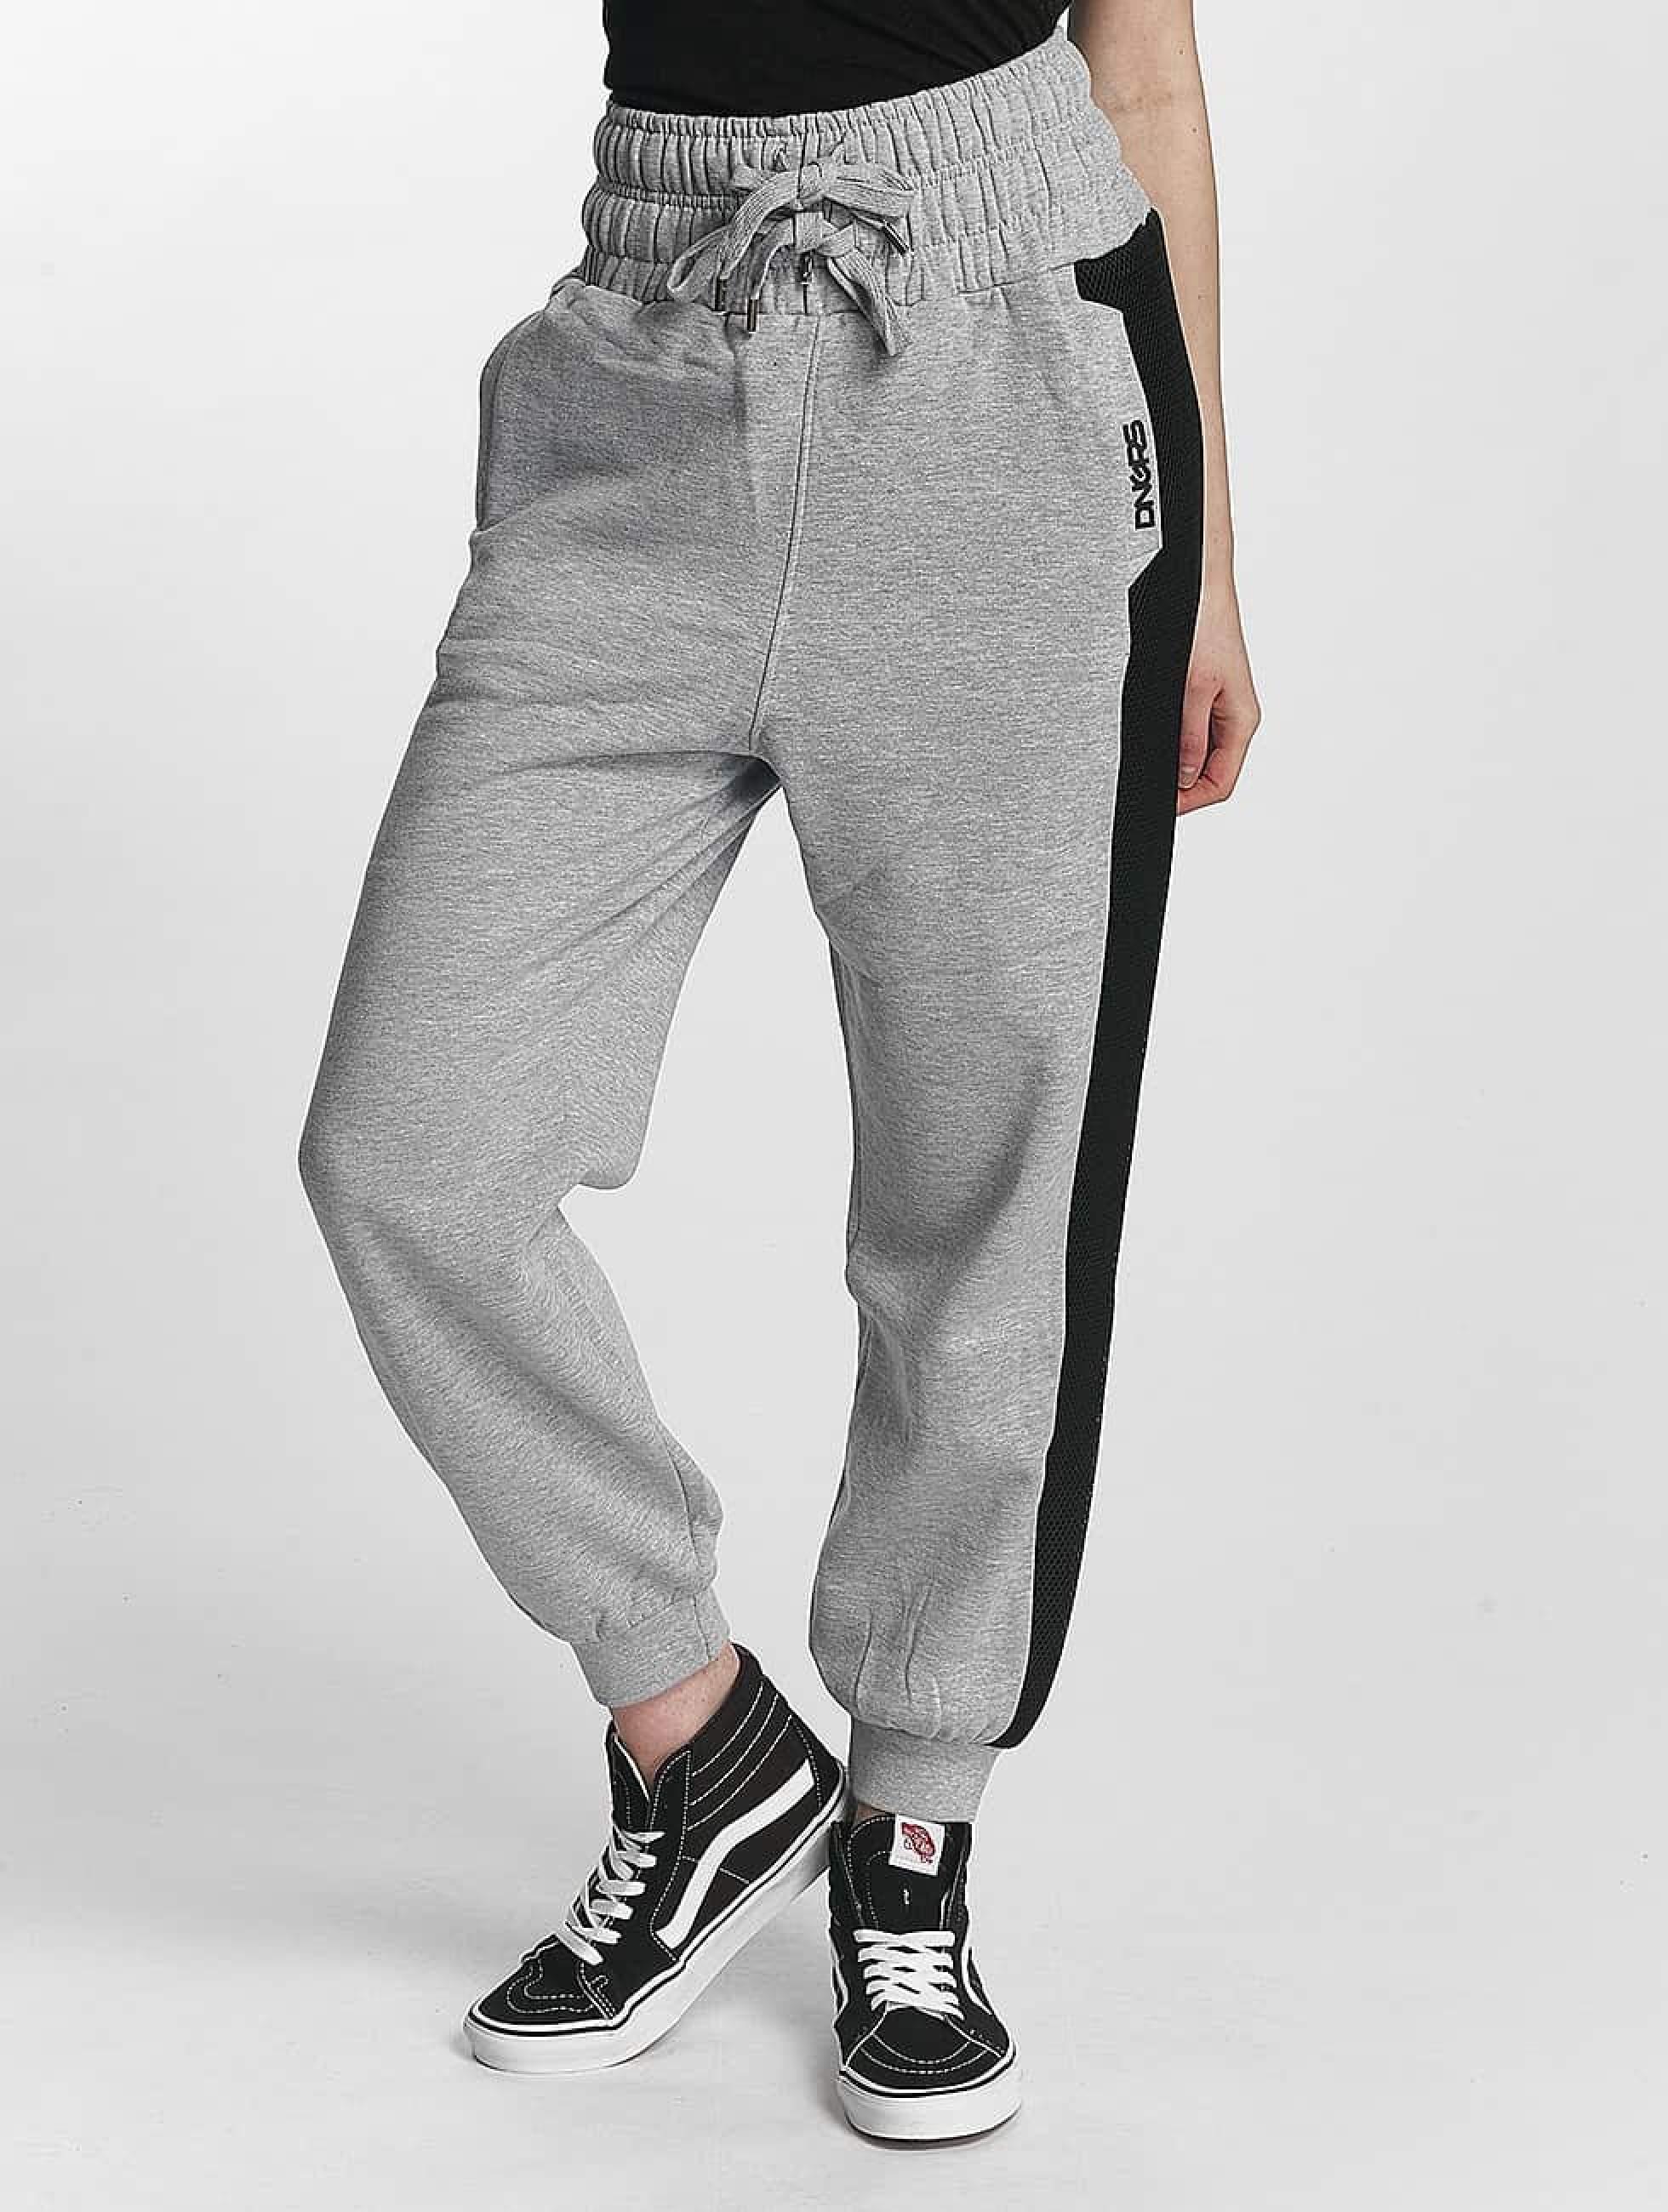 Dangerous DNGRS / Sweat Pant Freakout in grey XS